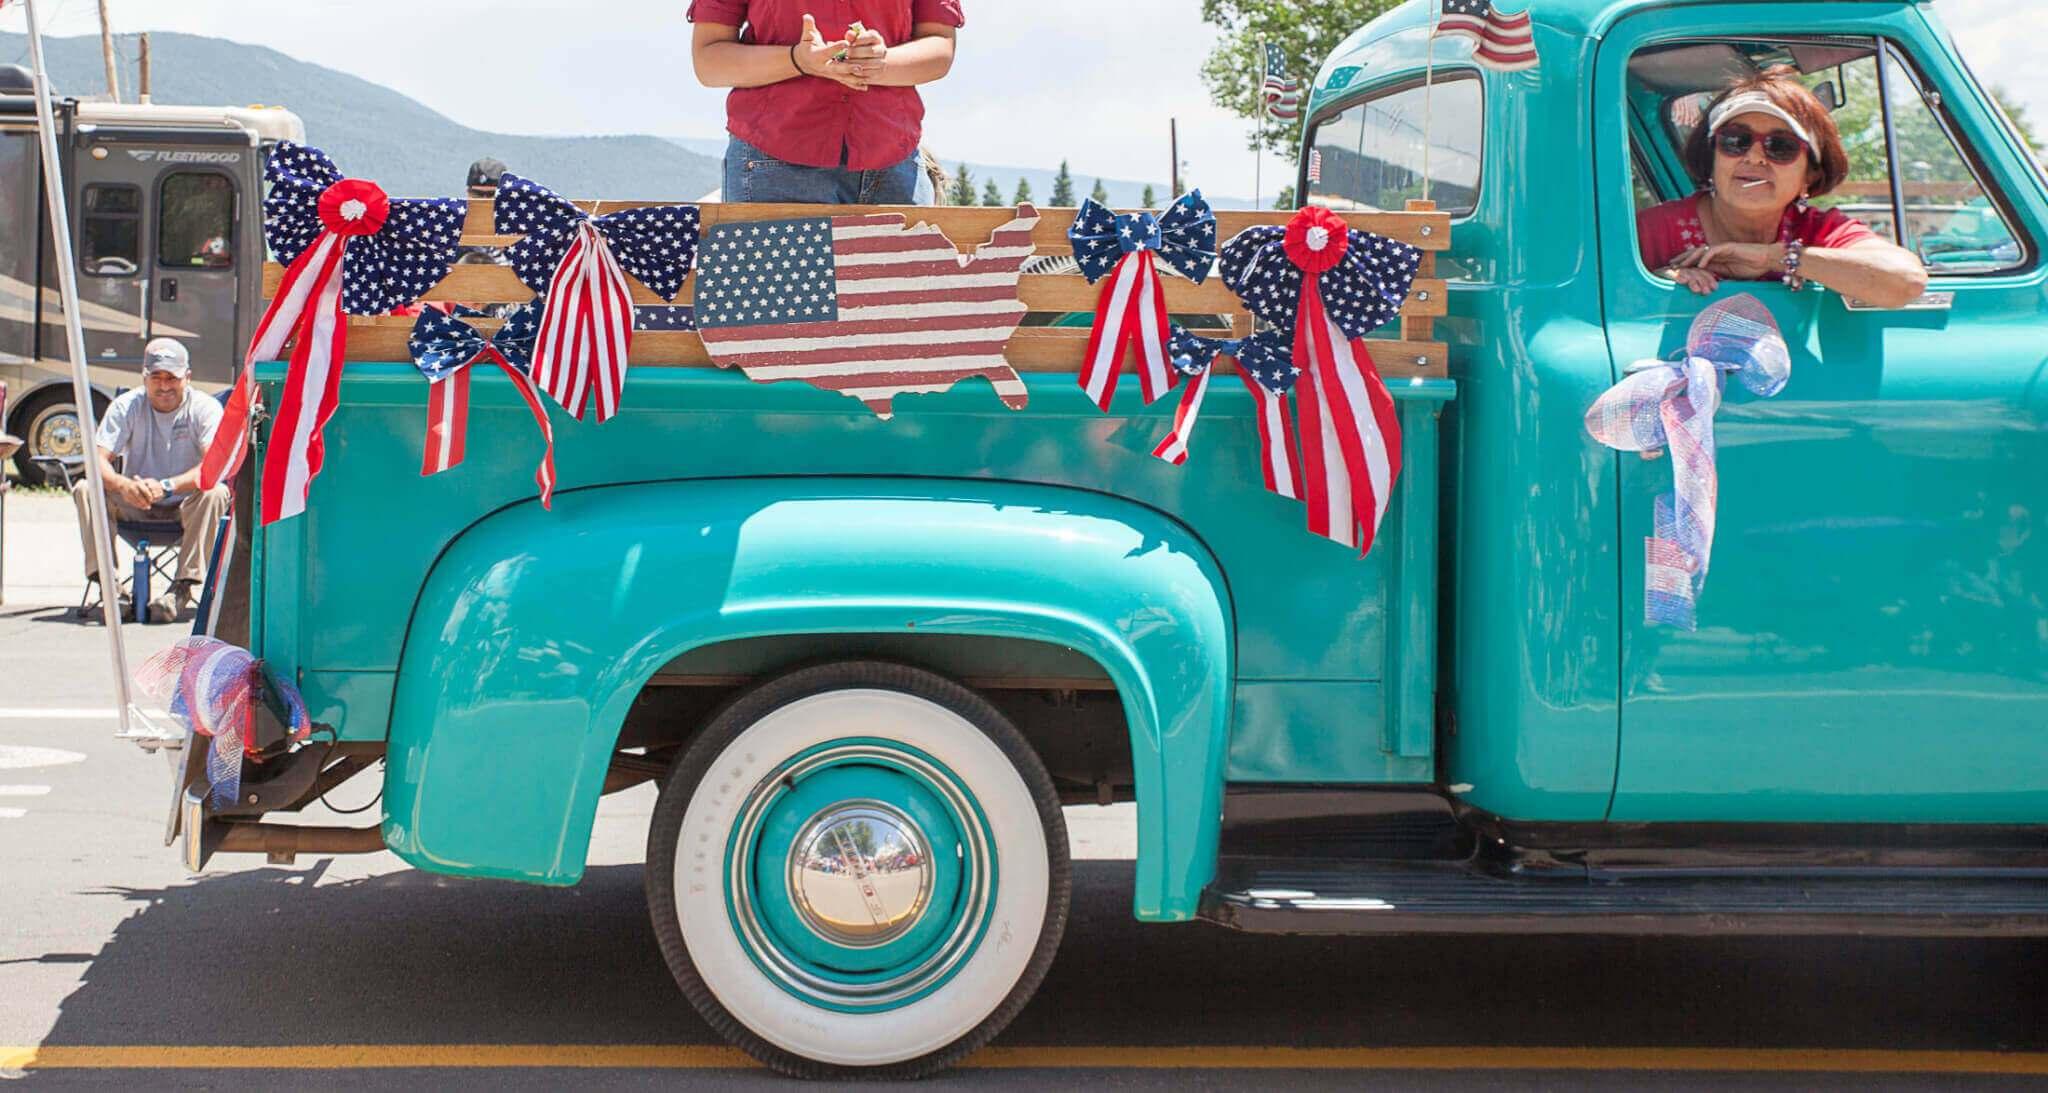 eagle next 4th of july parade-2